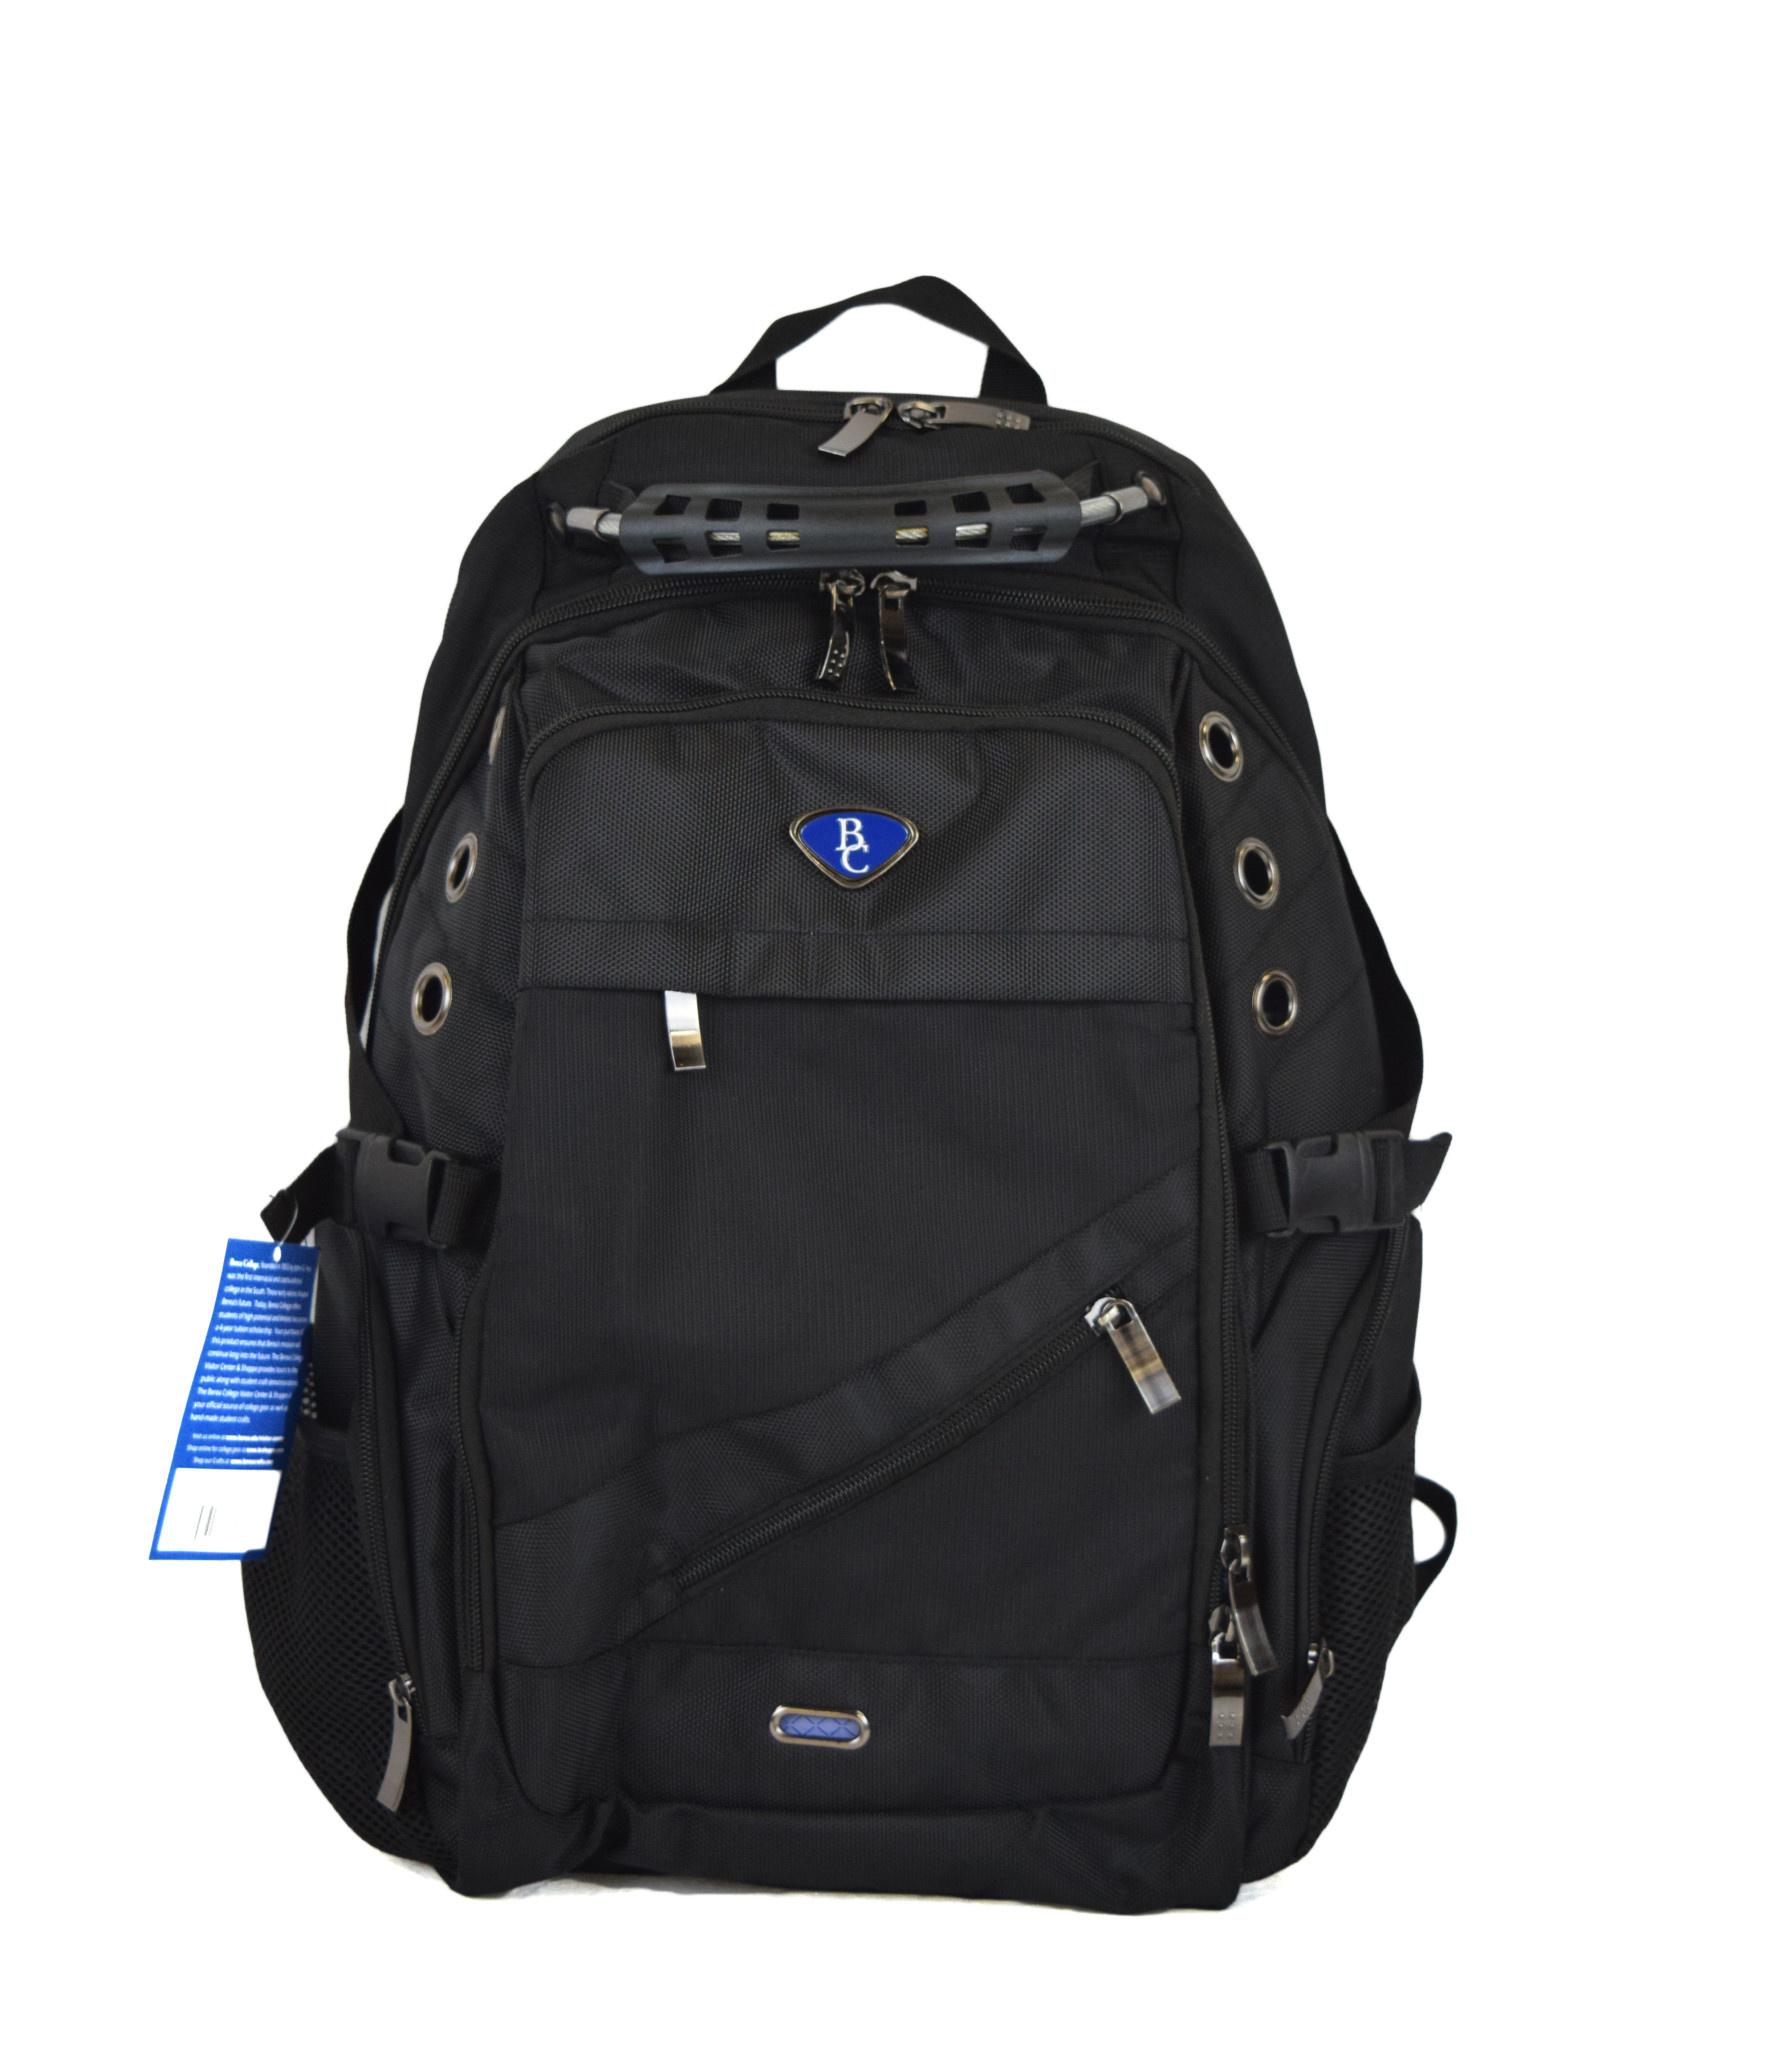 BC Interlock Executive Backpack-1